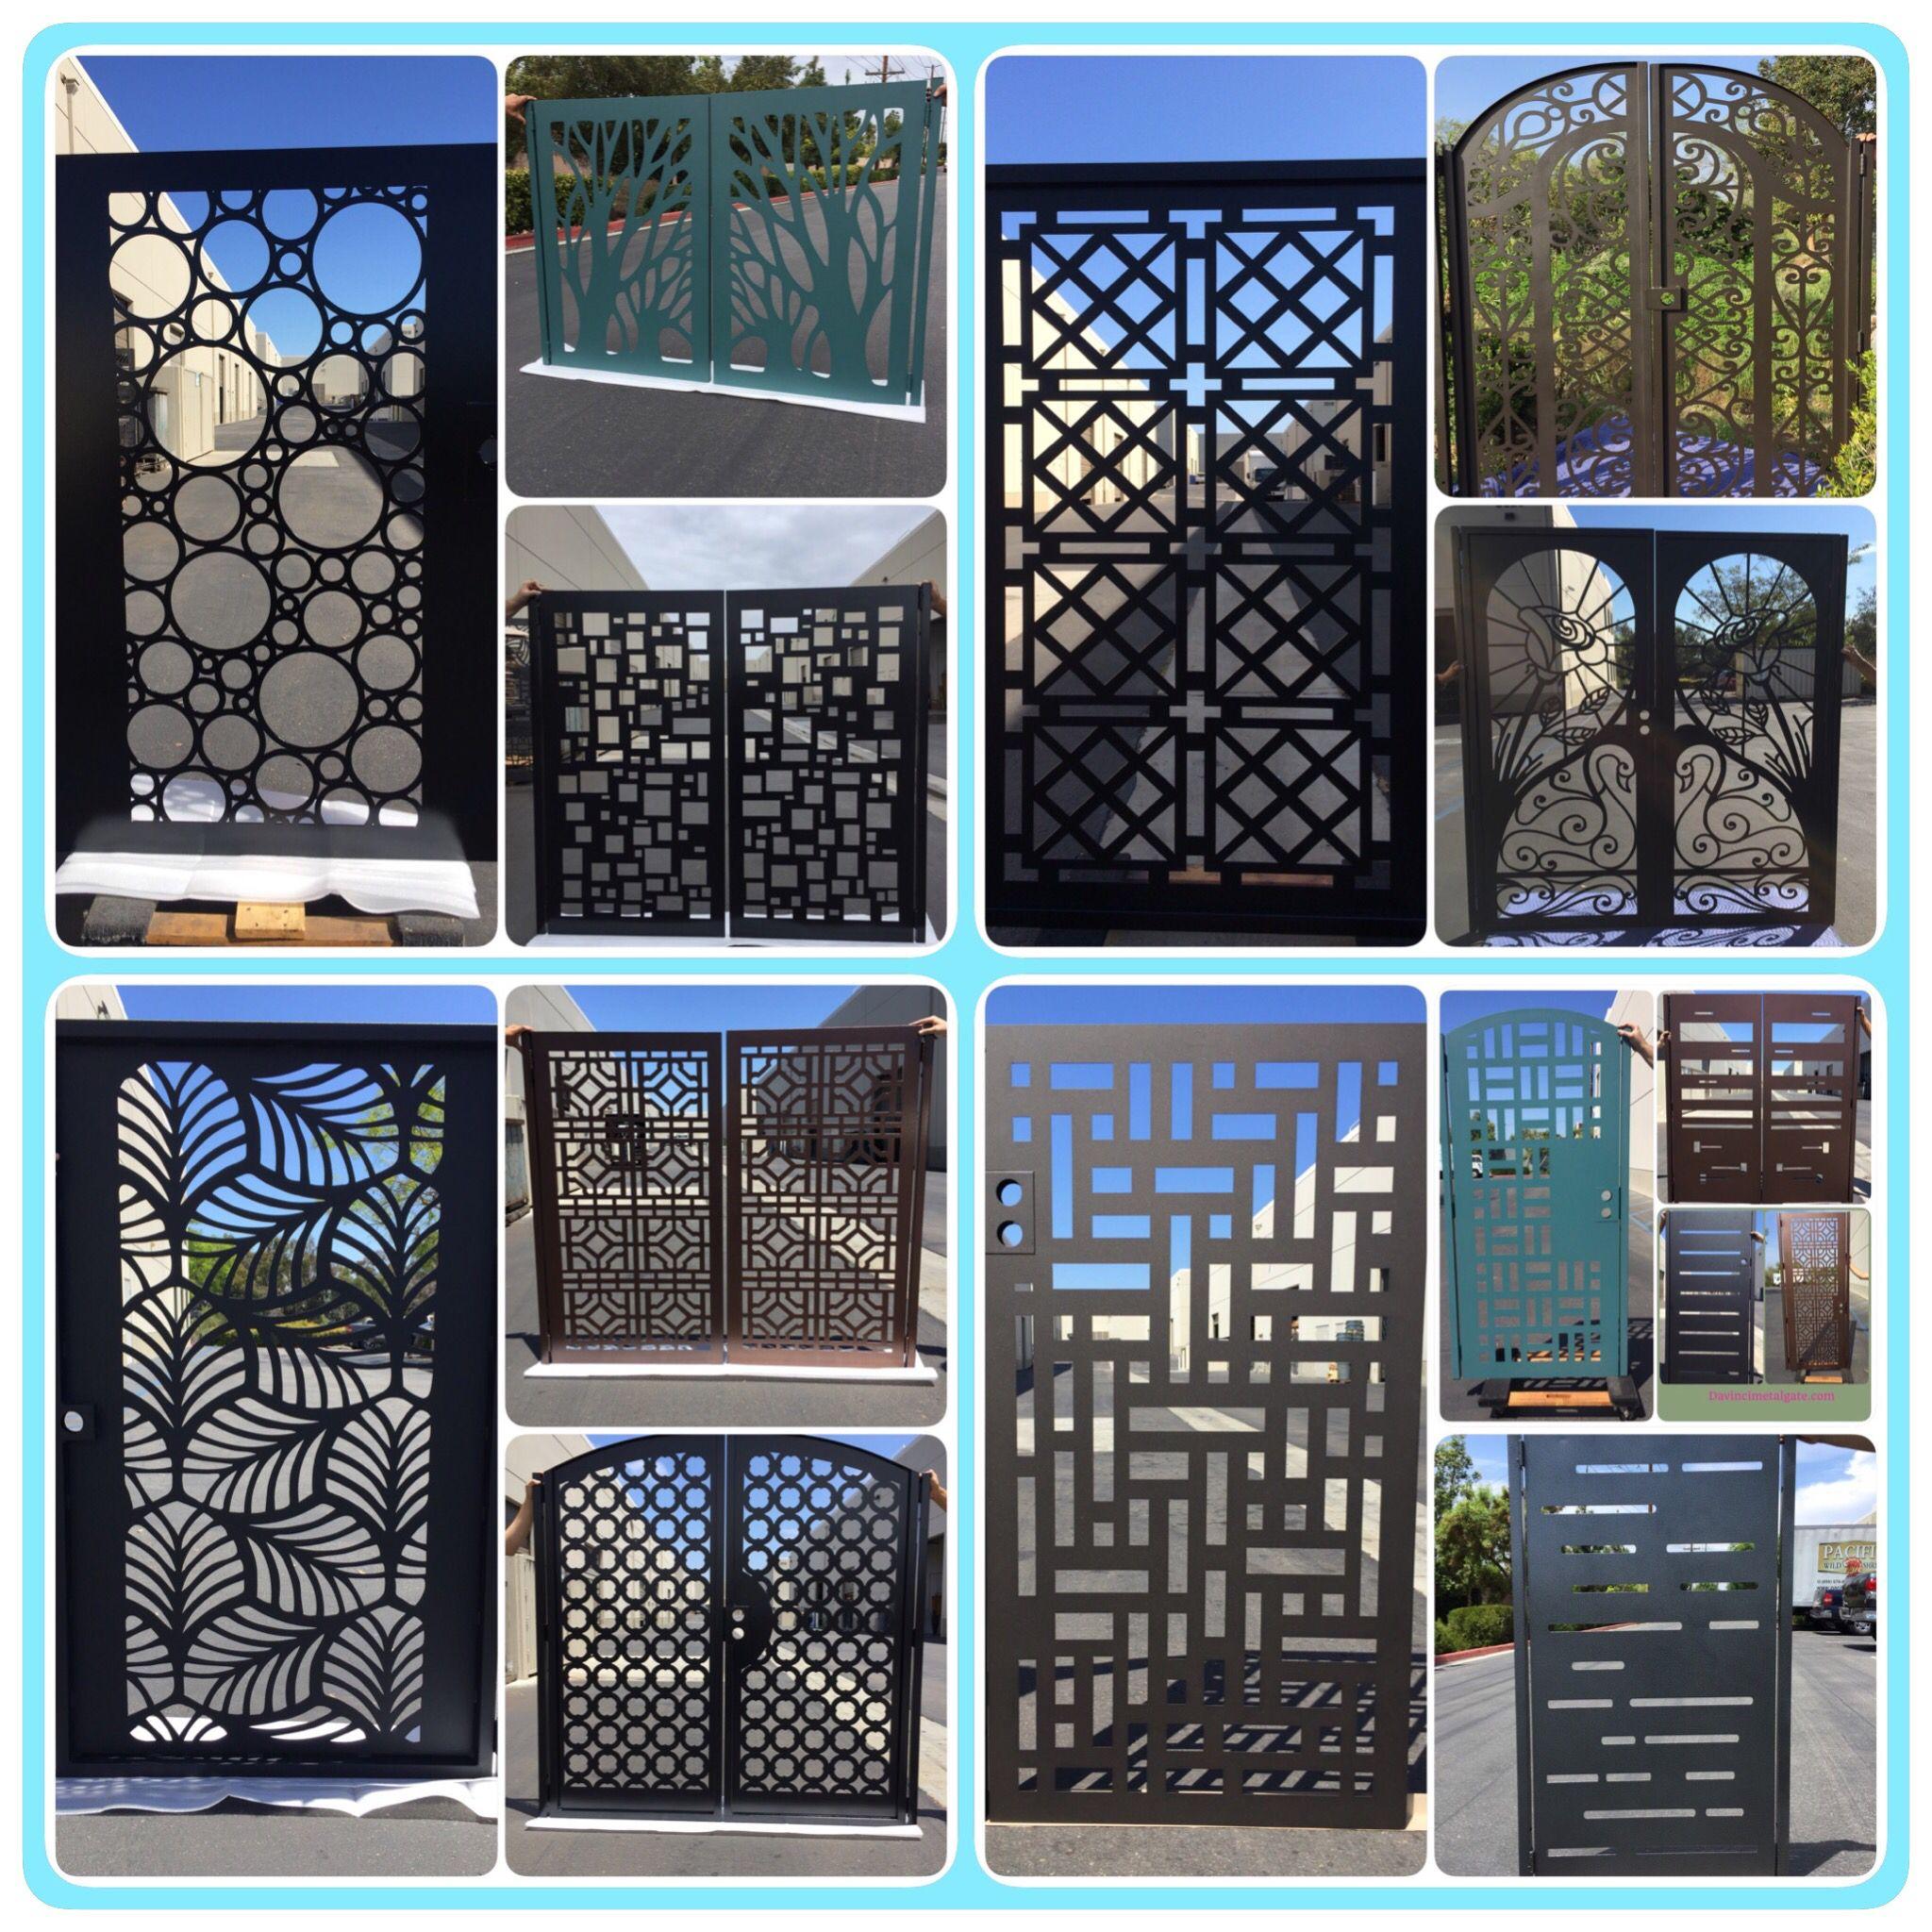 Modern Davinci Gate Puertas De Aluminio Exterior Protectores De Ventanas Puertas De Acero